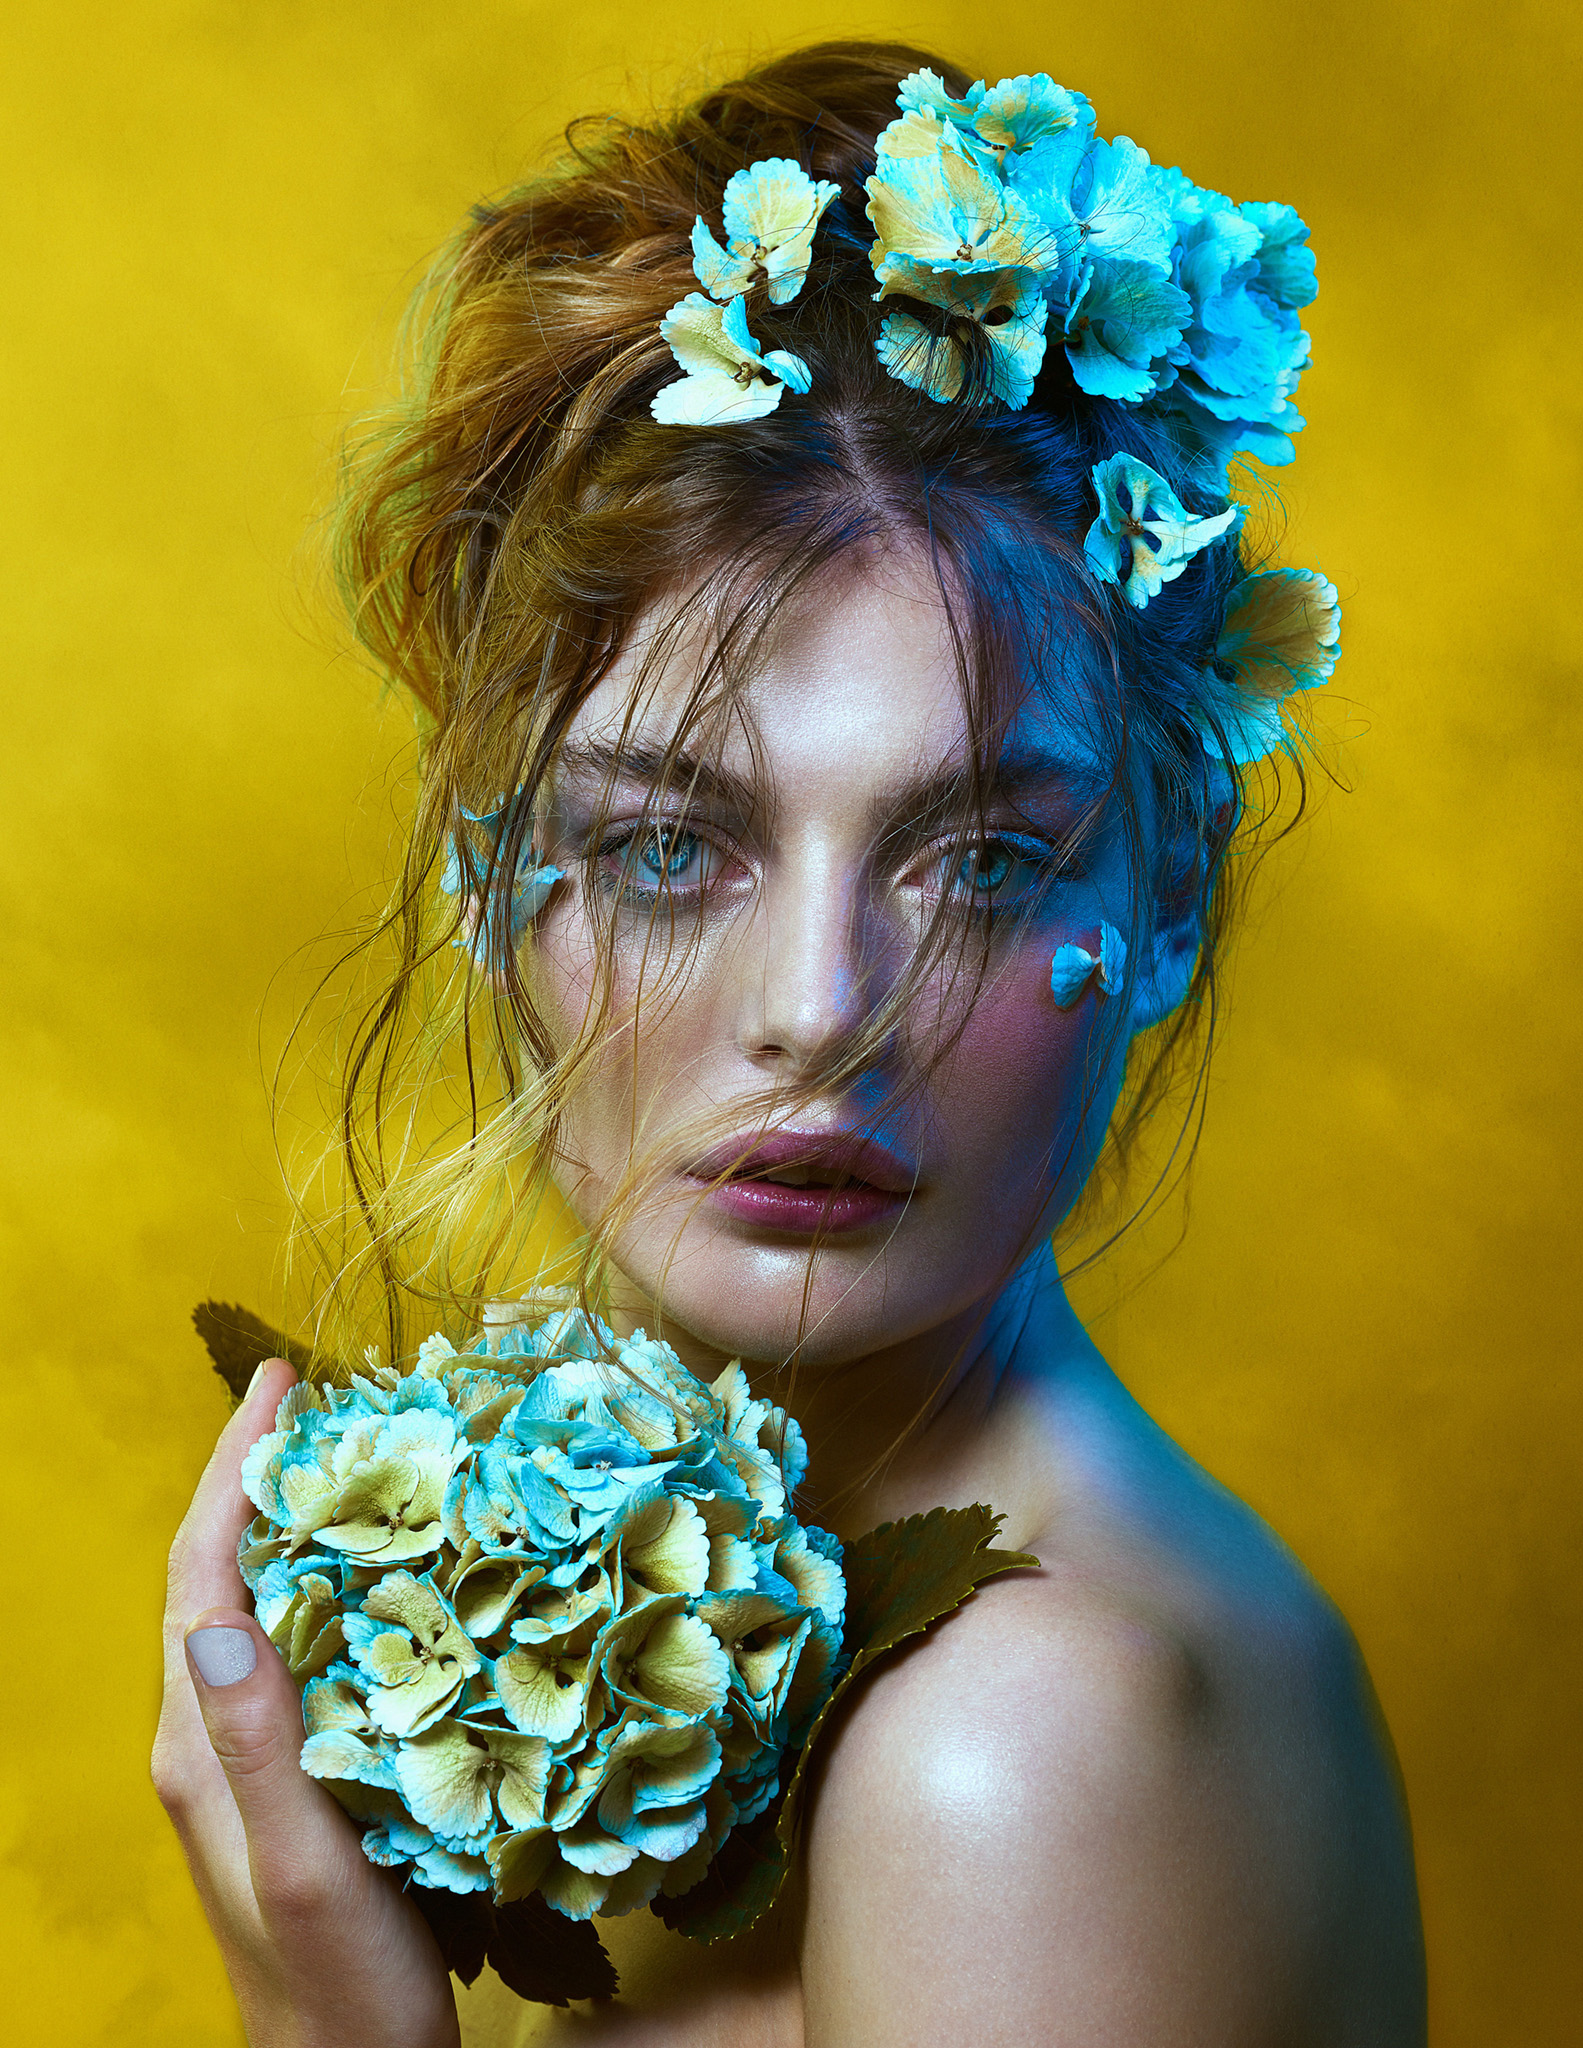 bella-kotak-phase-one-phaseone-profoto-lucysmagazine-profoto-solstice-retouch-beauty-editorial-fashion-mac-cosmetics-glitter-eyes-flower-hydrangea-2